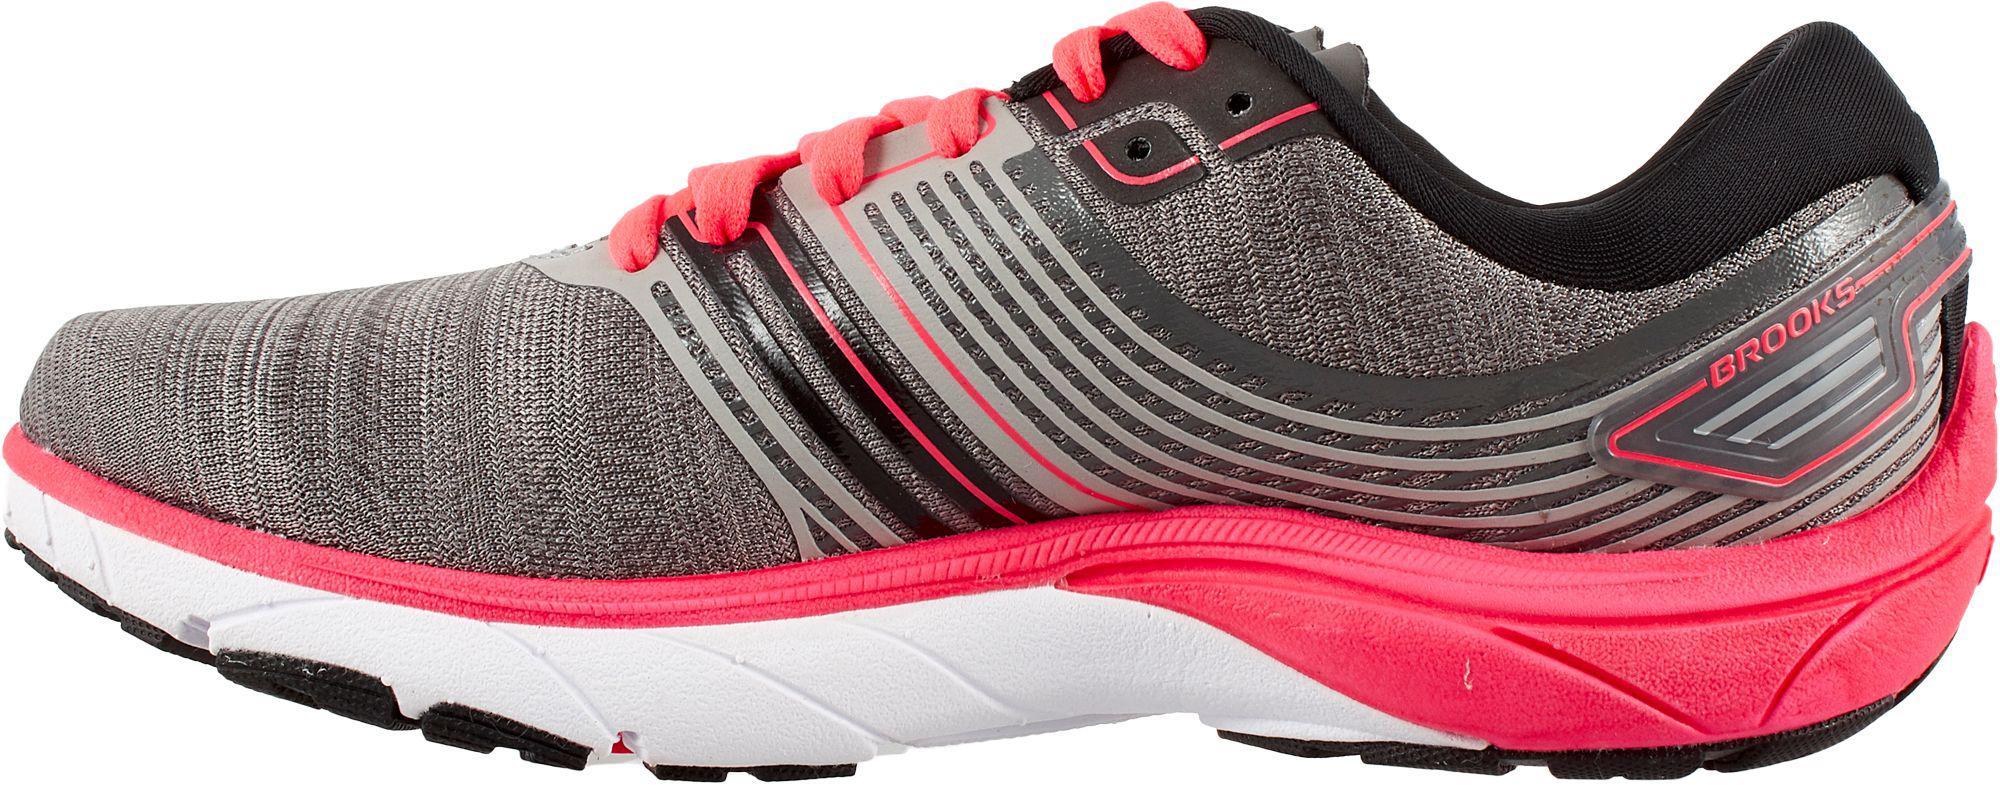 c529c743e2c Brooks - Multicolor Purecadence 6 Running Shoes - Lyst